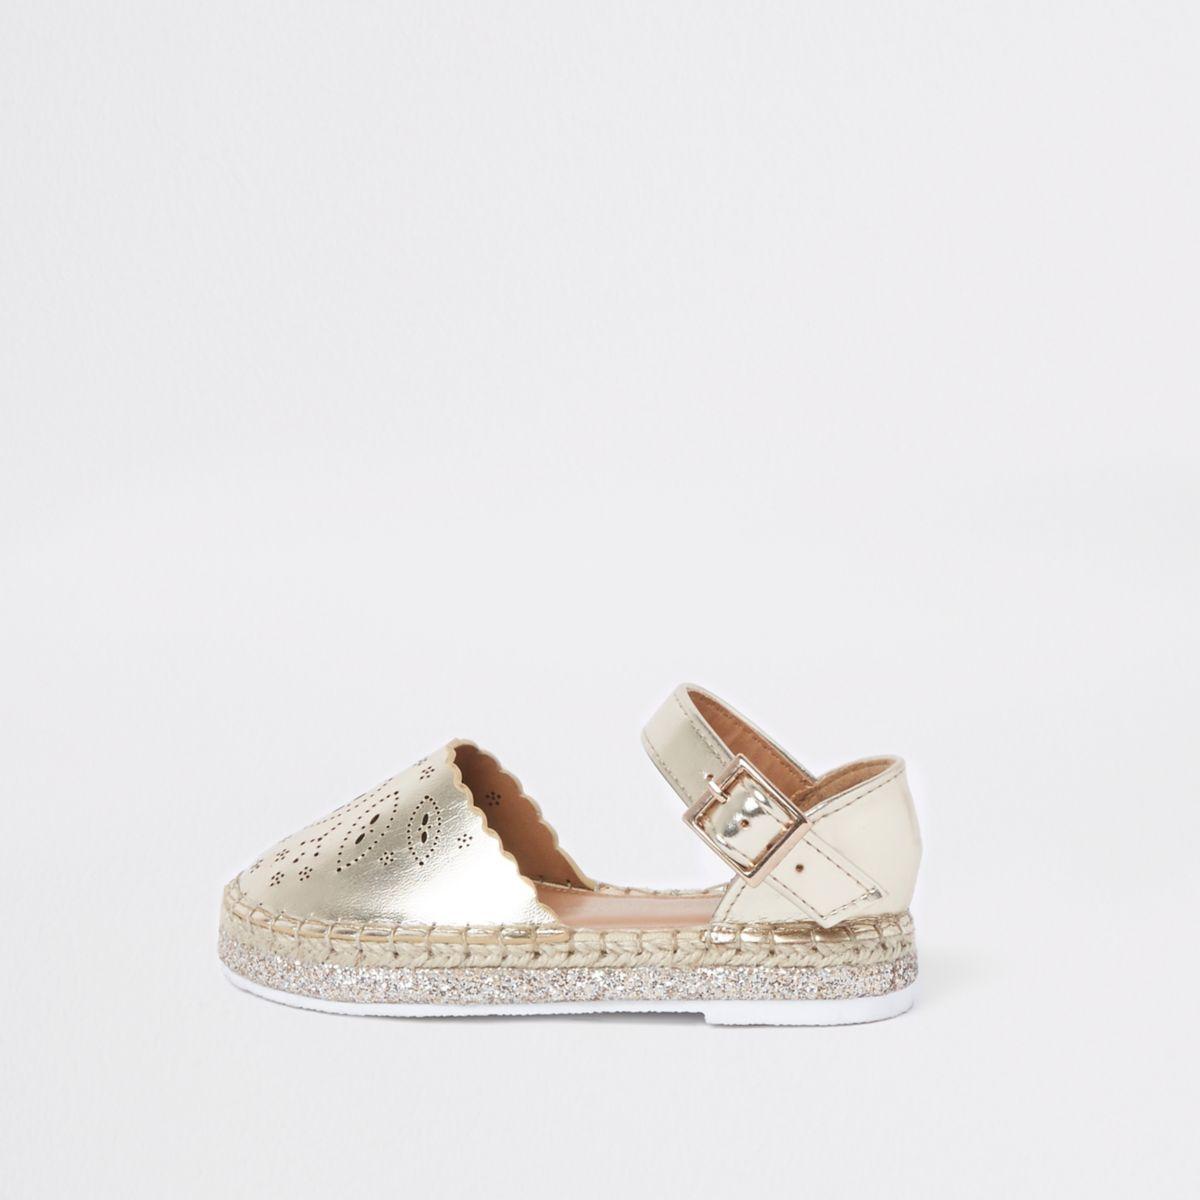 Goldene Espadrille-Sandalen mit Laserschnittmuster